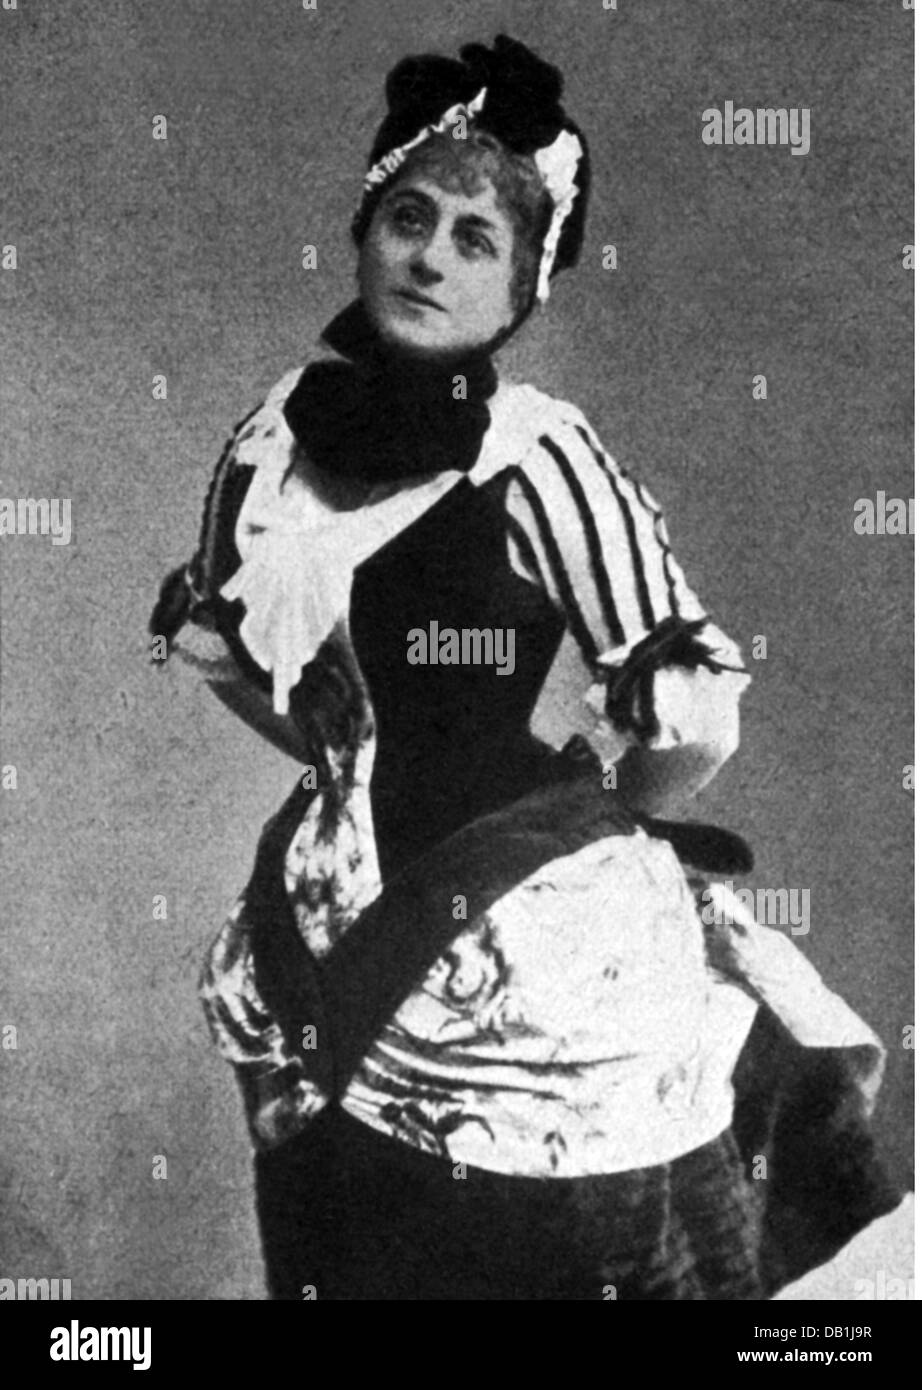 "Stubel, Ludmilla ""Milli"", 11.9.1852 - nach 12.7.1890, österreichische Tänzerin, halbe Länge, Stockbild"